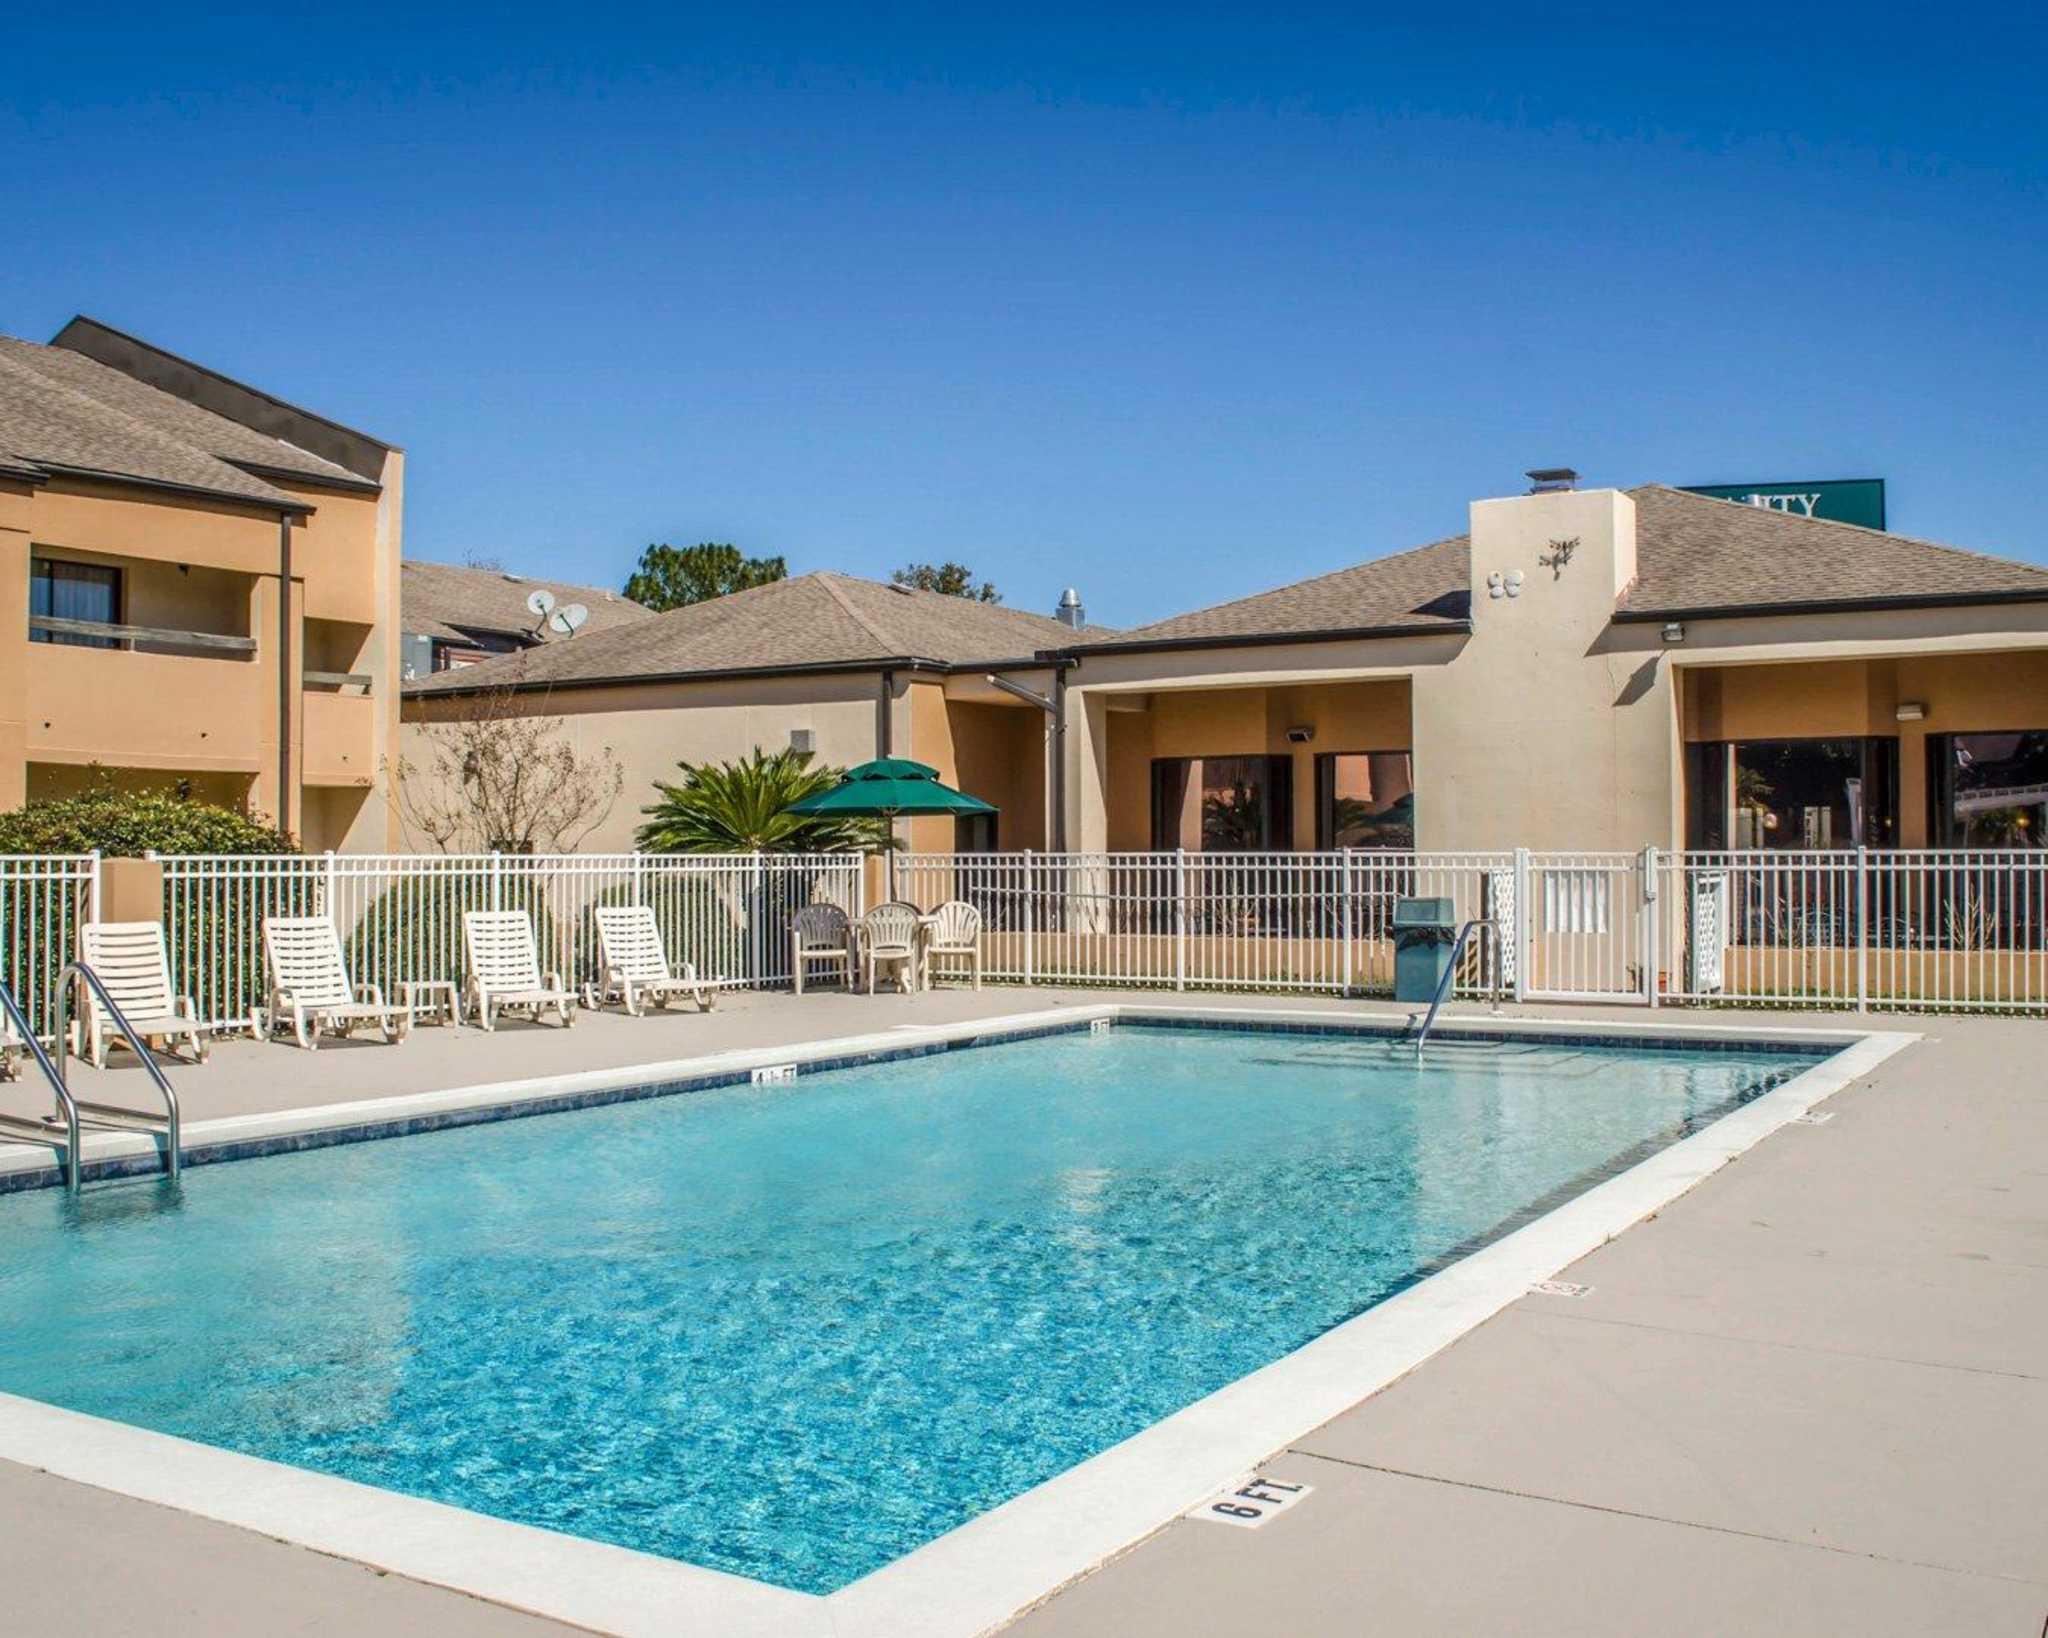 Quality Inn & Suites Pensacola Bayview in Pensacola, FL, photo #25